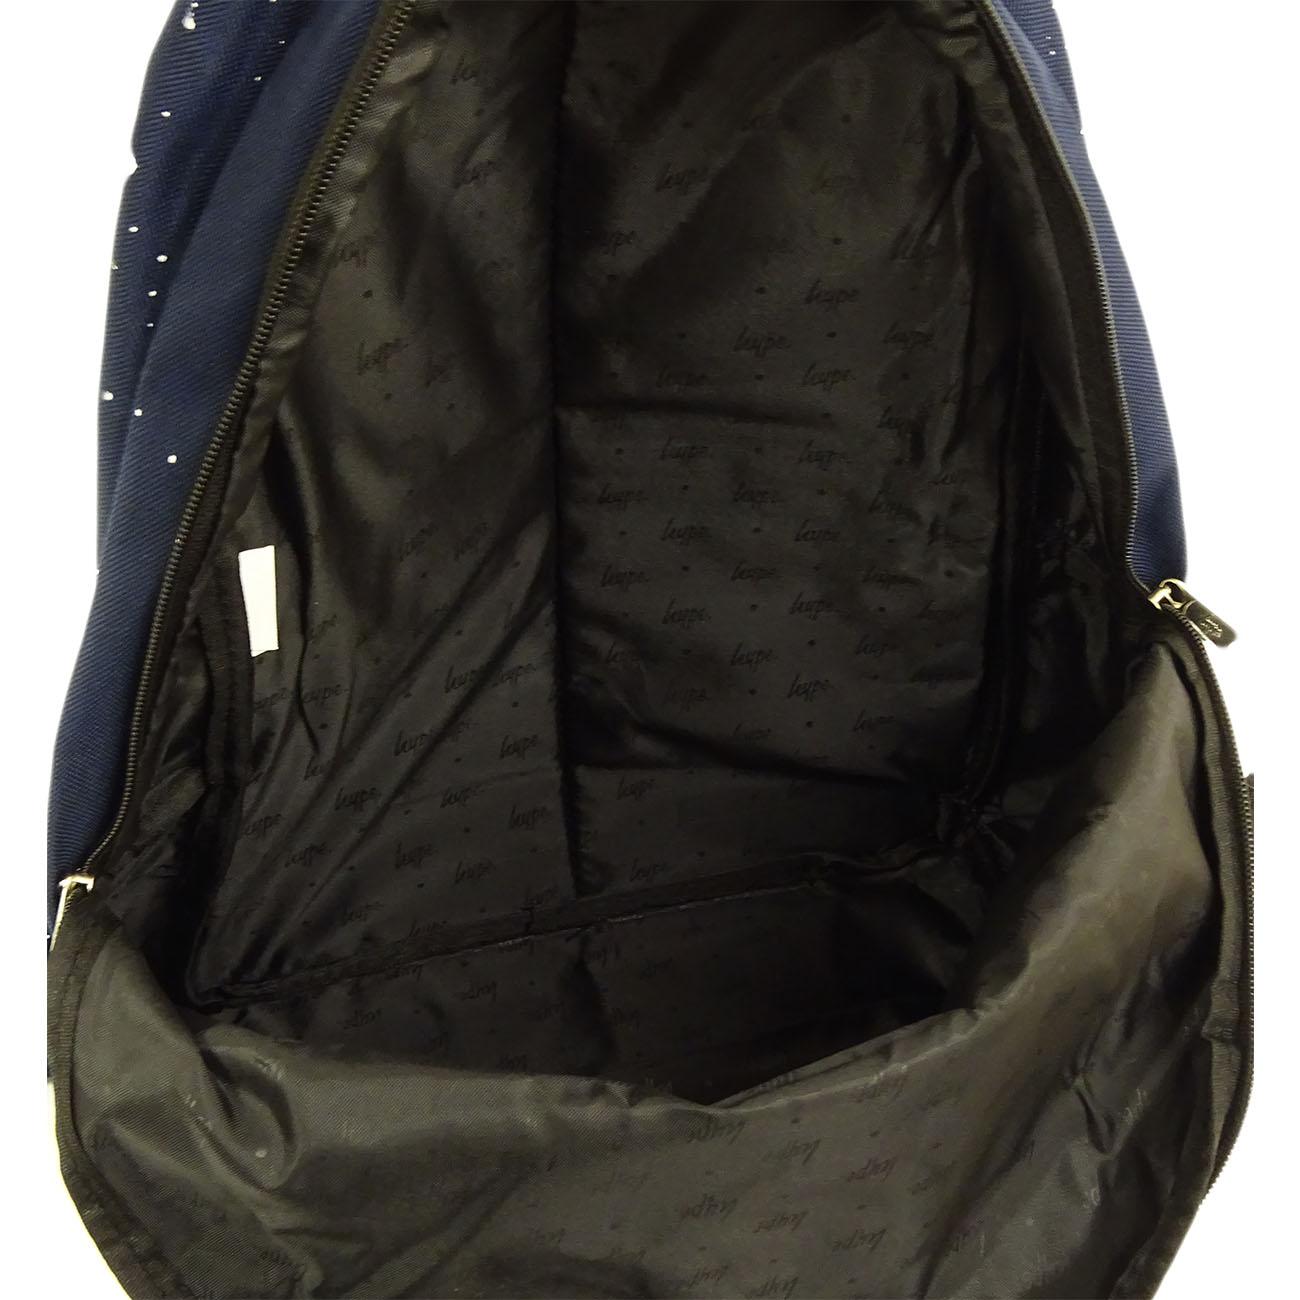 Unisexe-Hype-Sac-A-Dos-Ecole-Gym-SACS-pochettes-pencil-case miniature 213